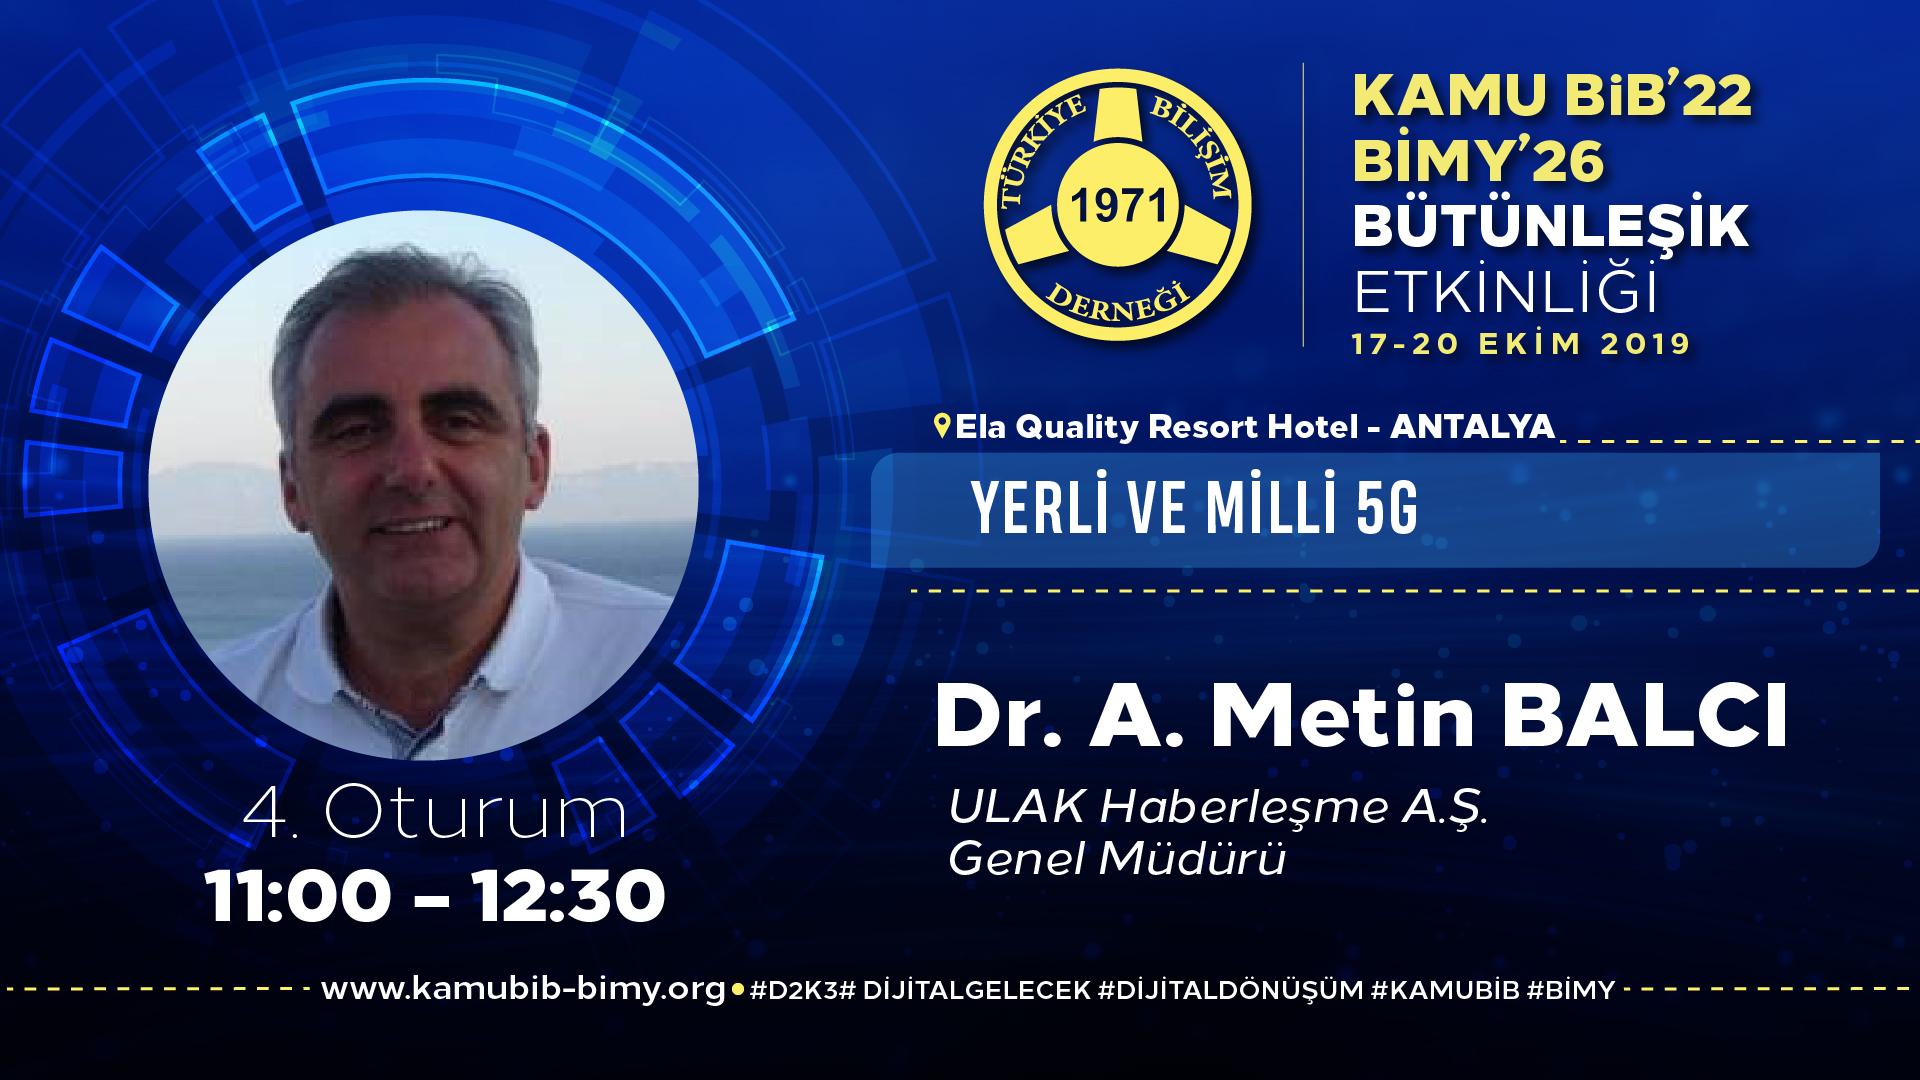 Dr. A. Metin BALCI - KamuBİB'22 BİMY'26